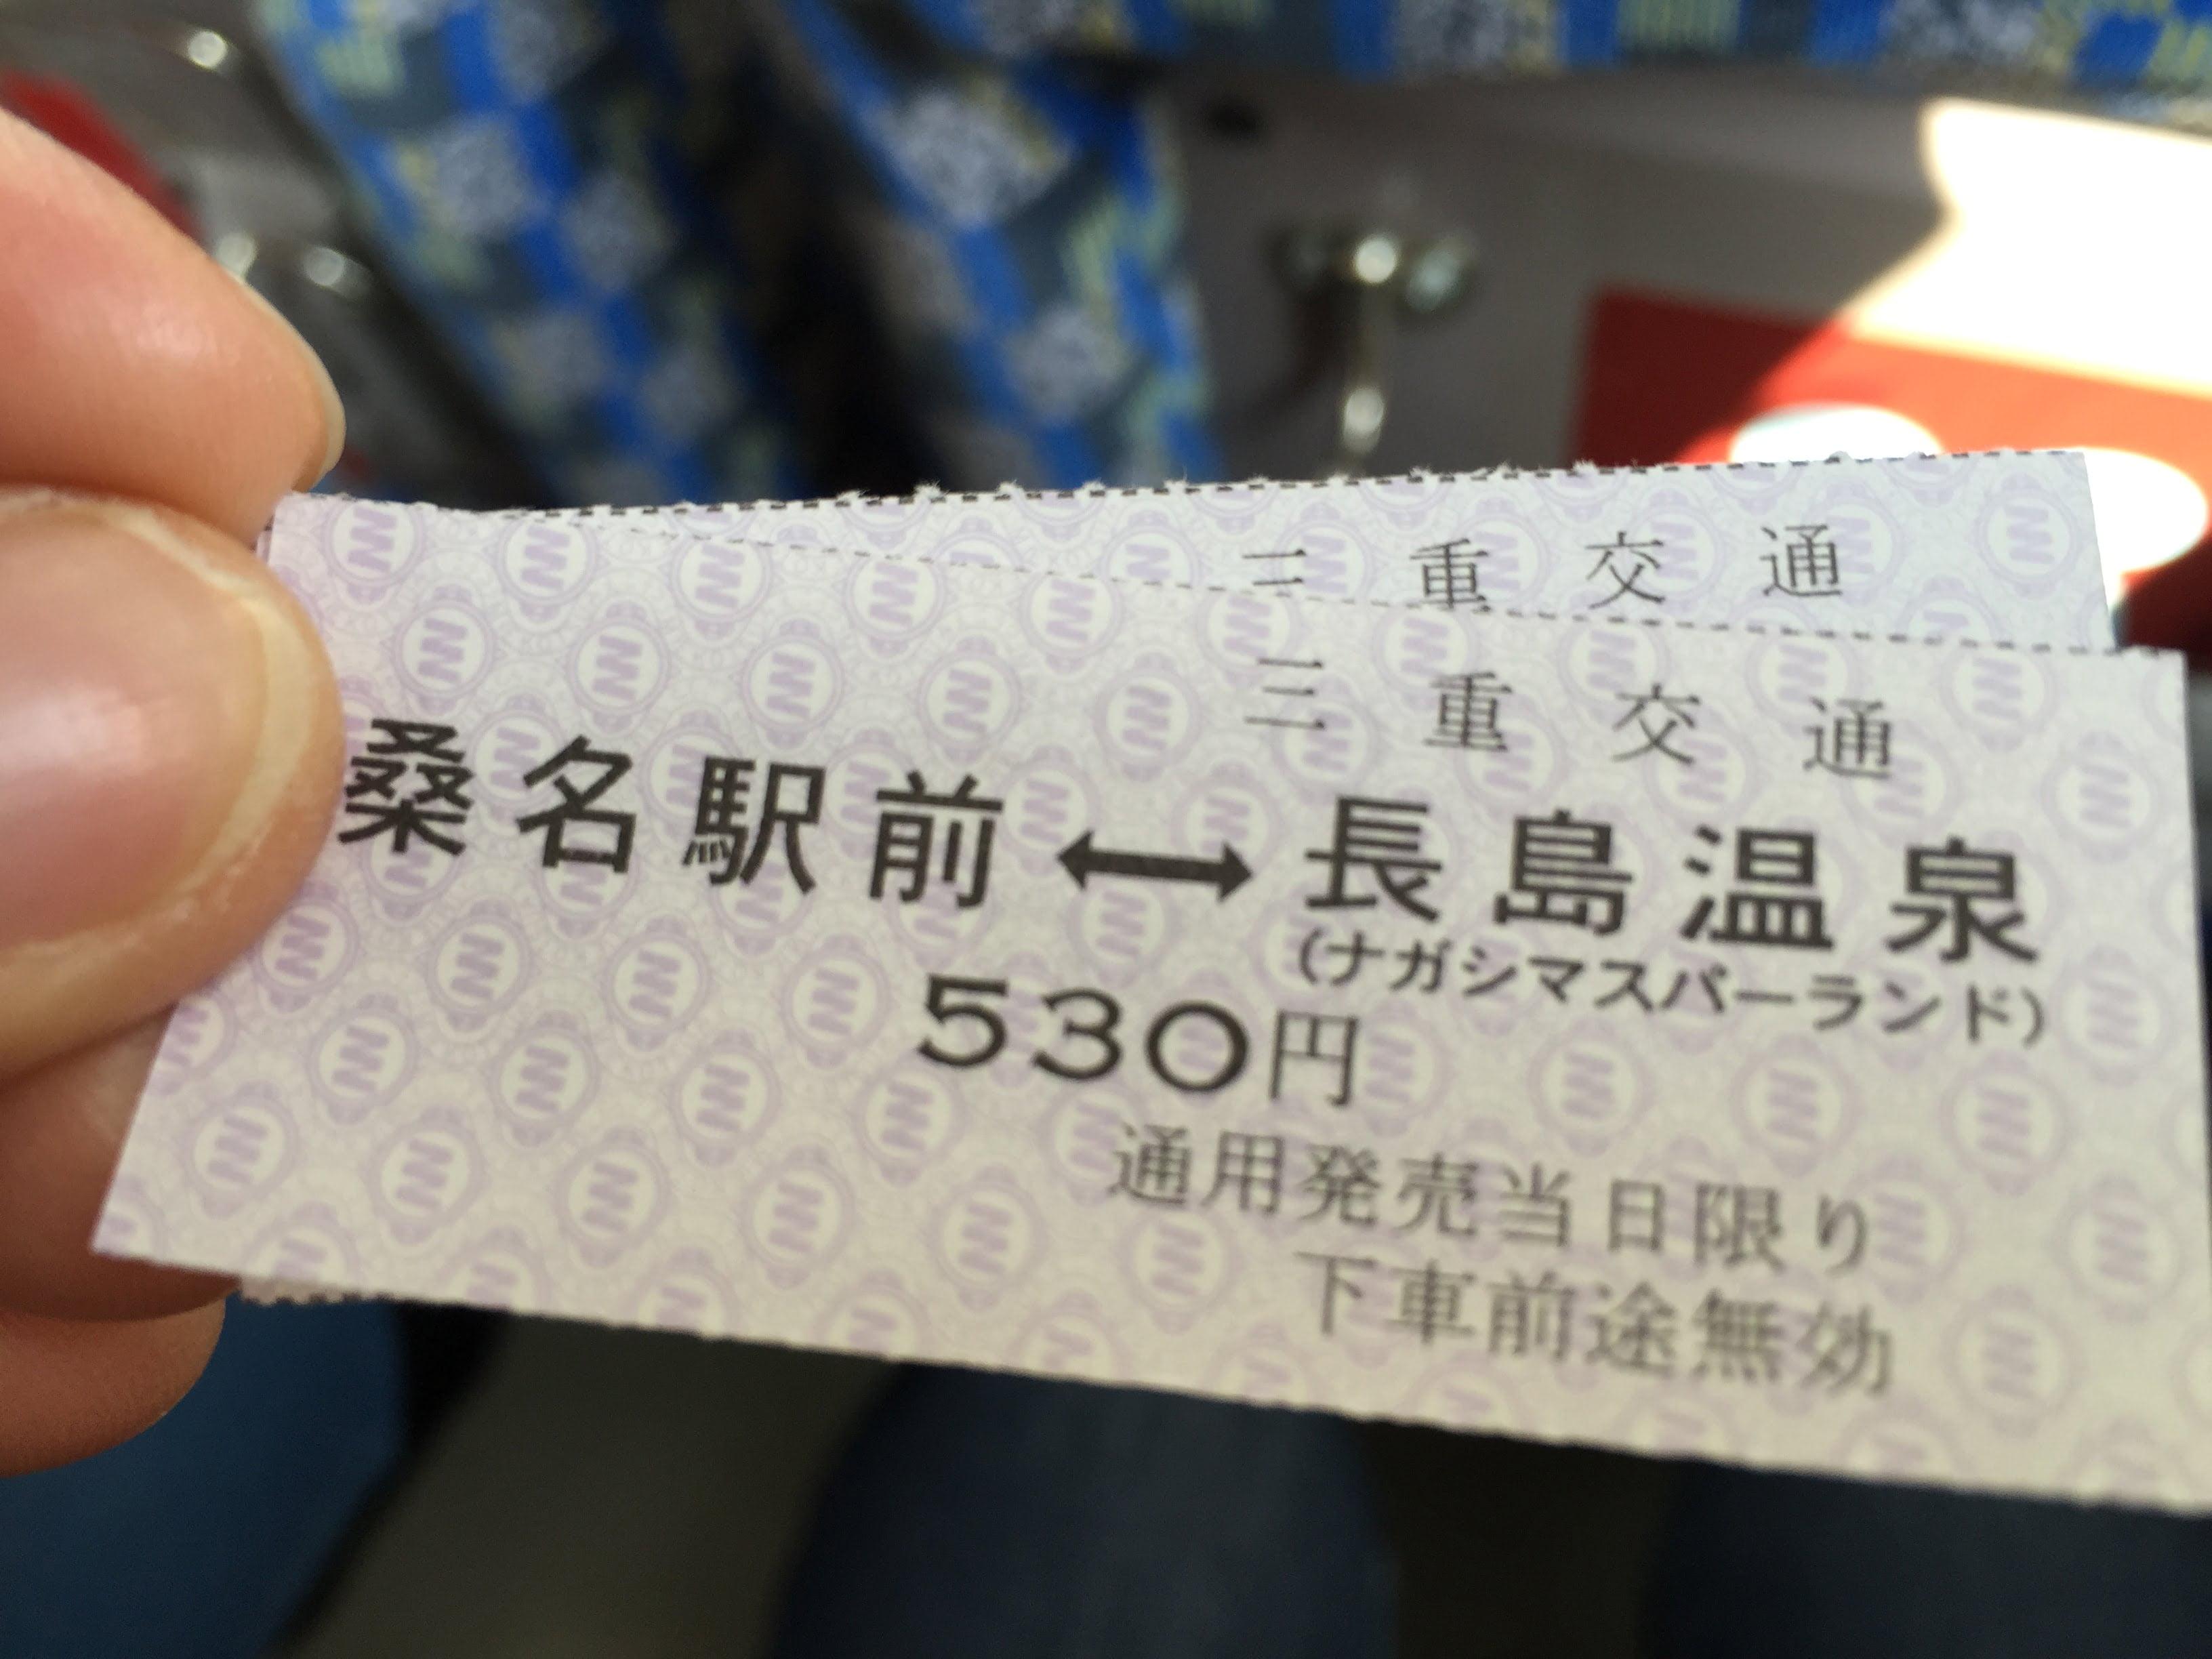 桑名站巴士往三重縣長島Outlet車票